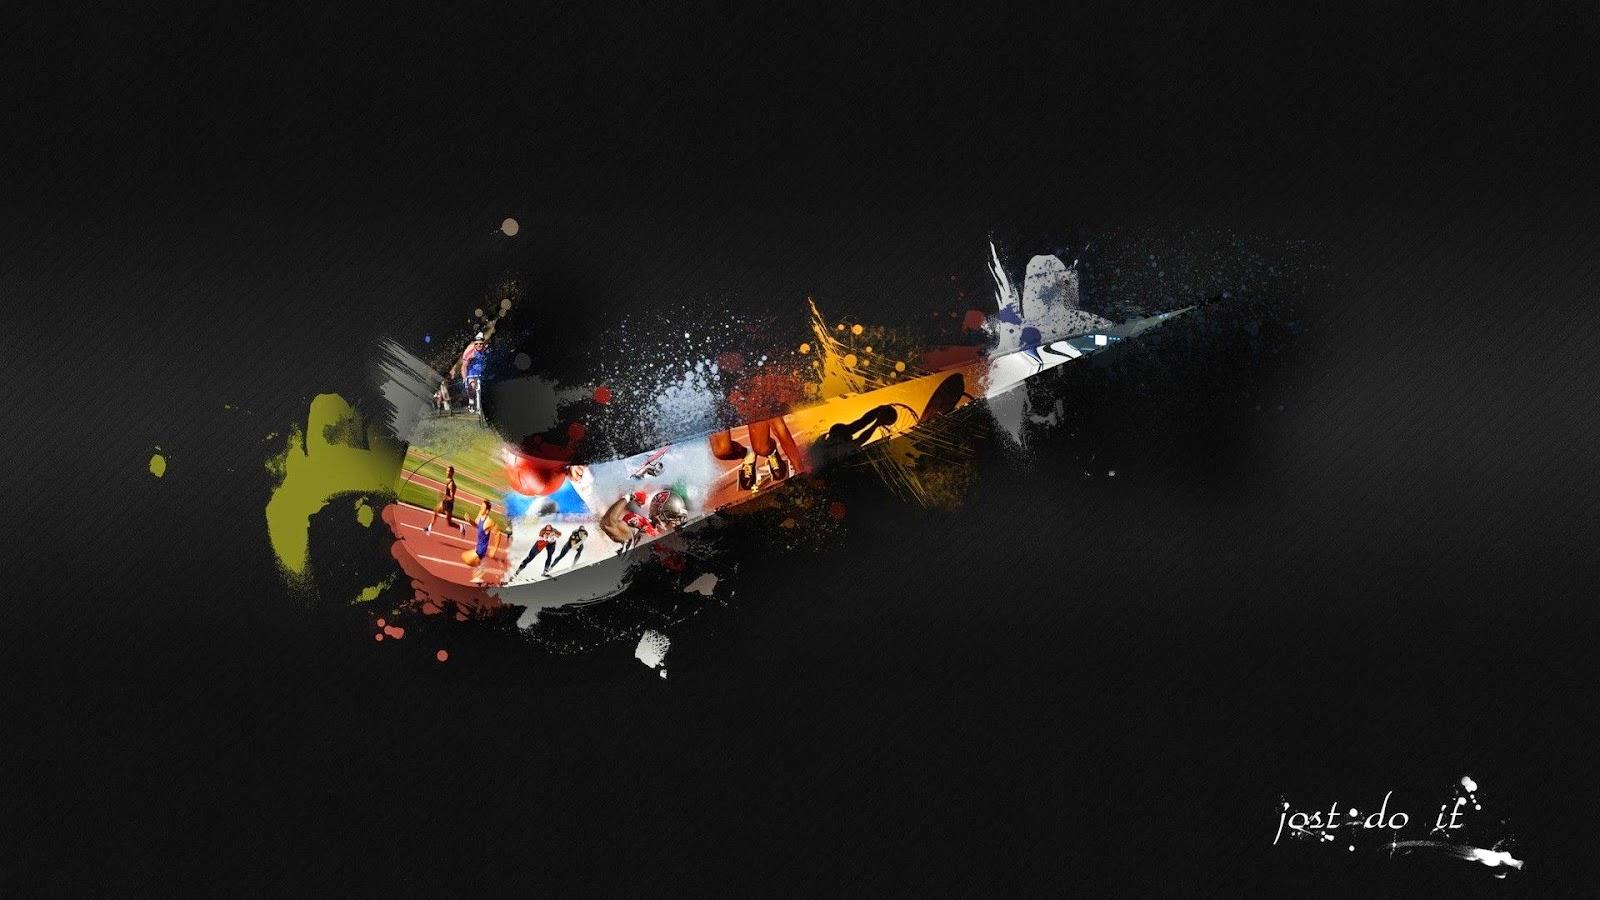 Cool Nike Logos 102 103171 Images HD Wallpapers Wallfoycom 1600x900